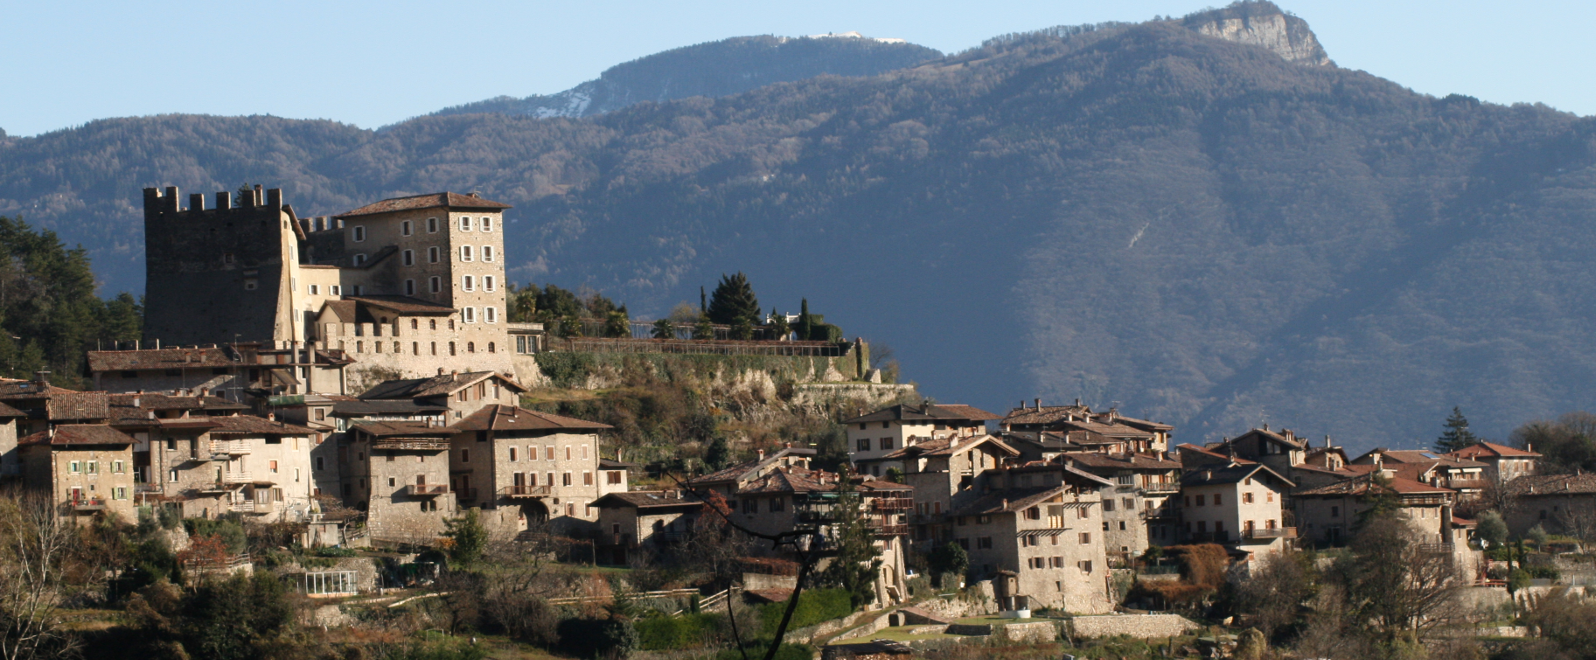 Borgo Tenno